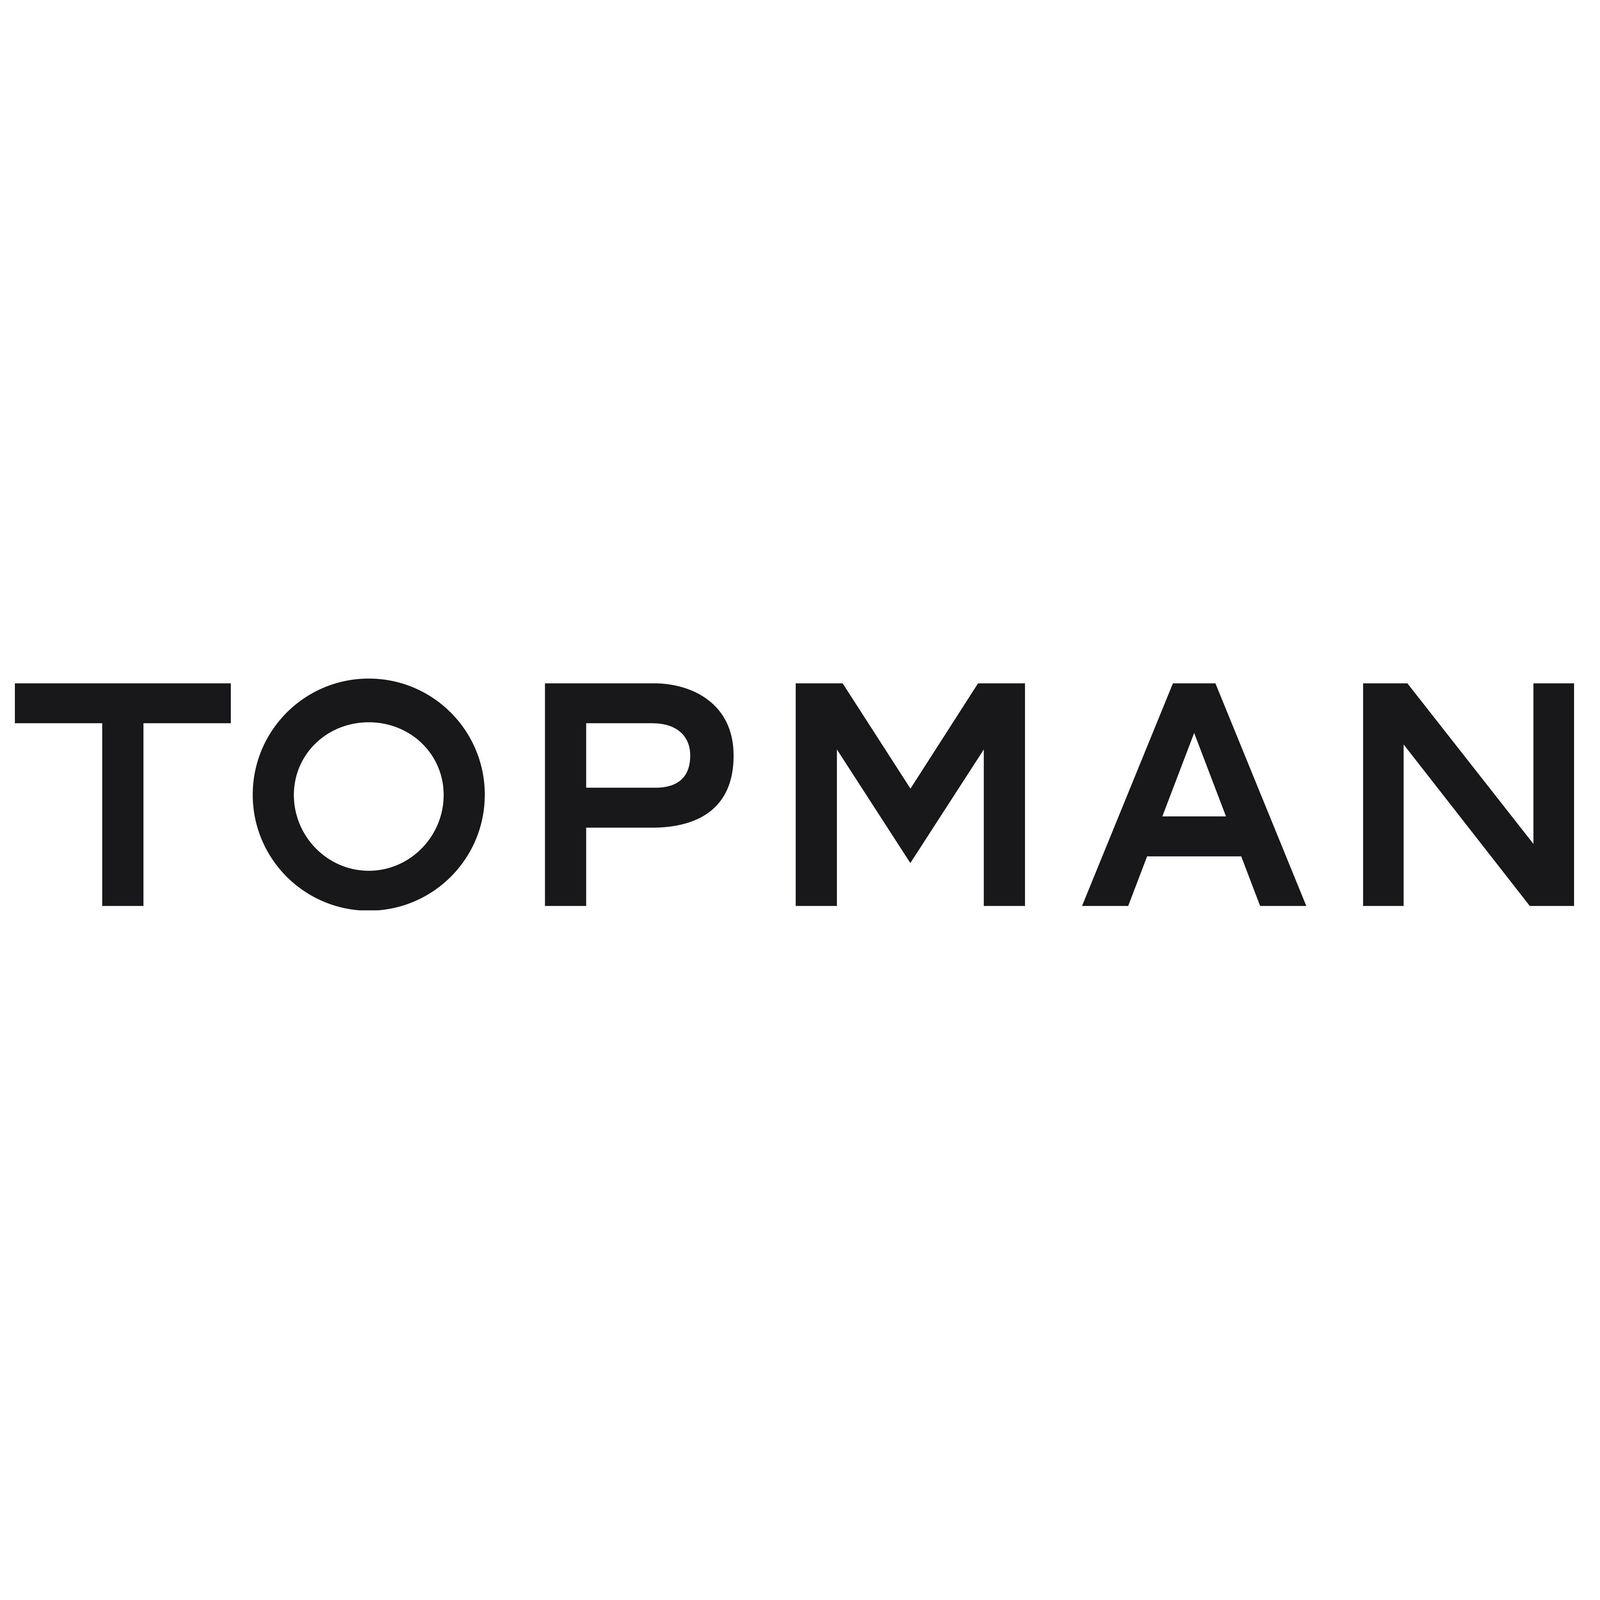 TOPMAN (Image 1)